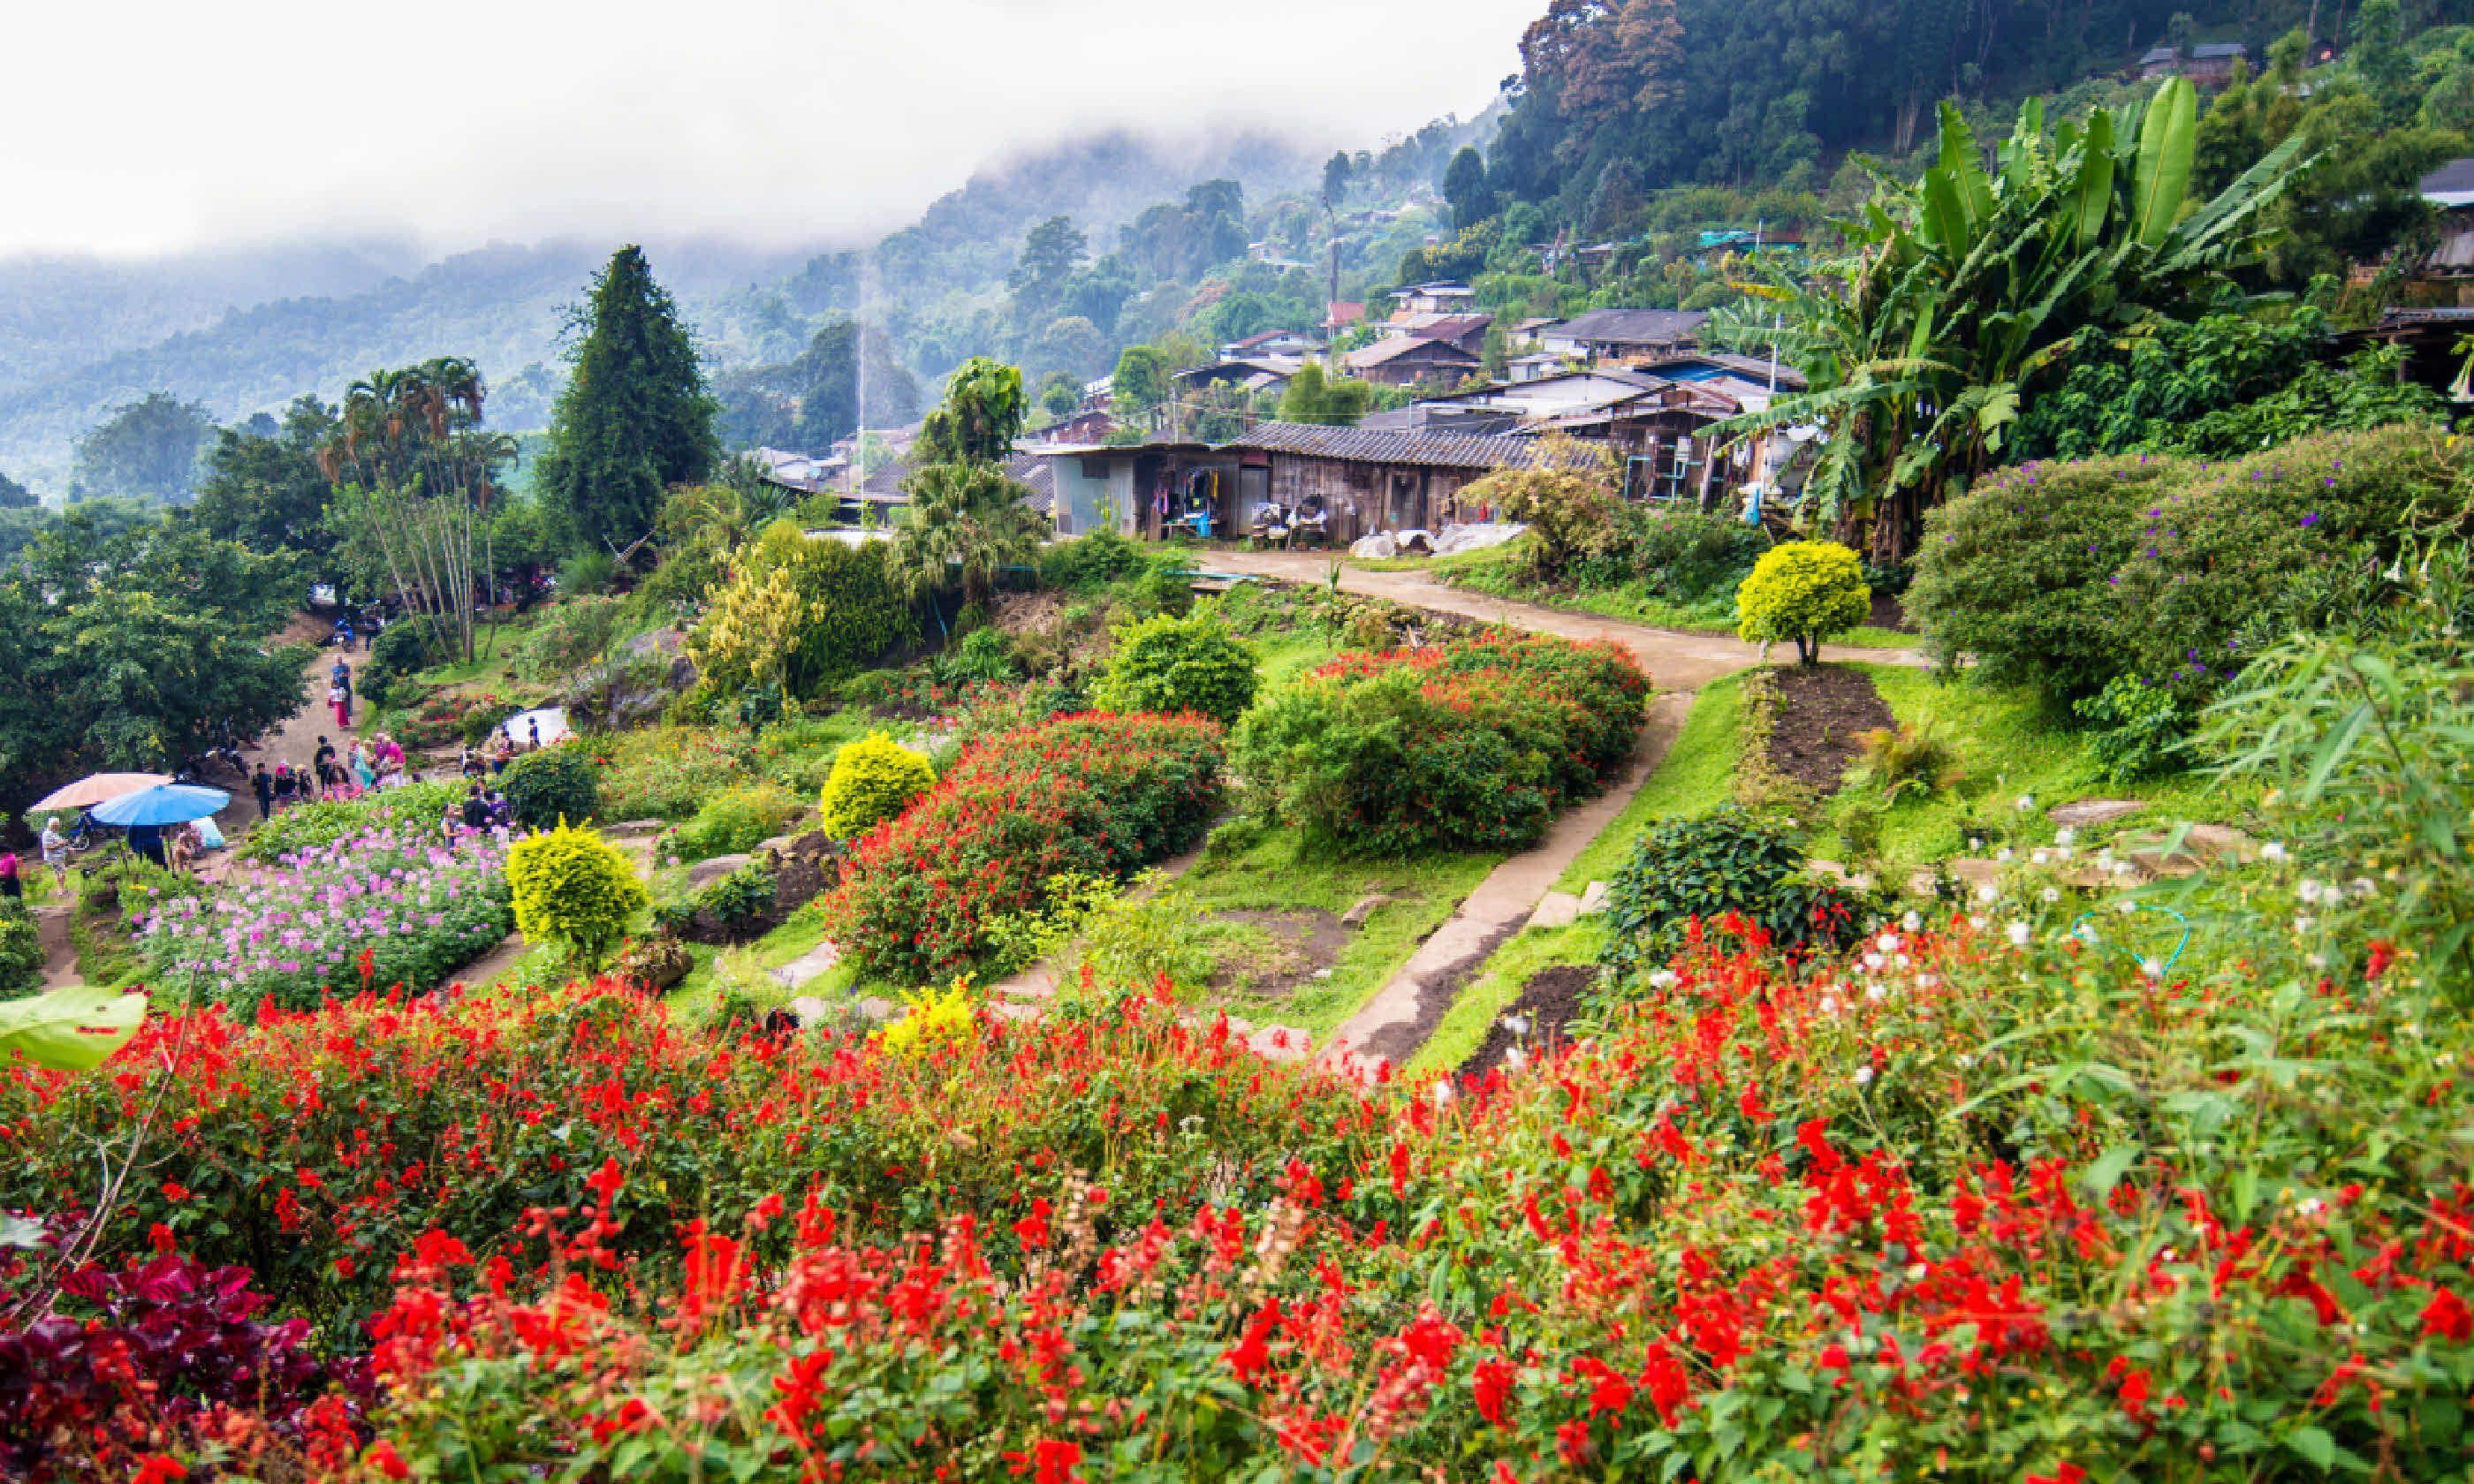 Chiang Rai, Thailand (Shutterstock)